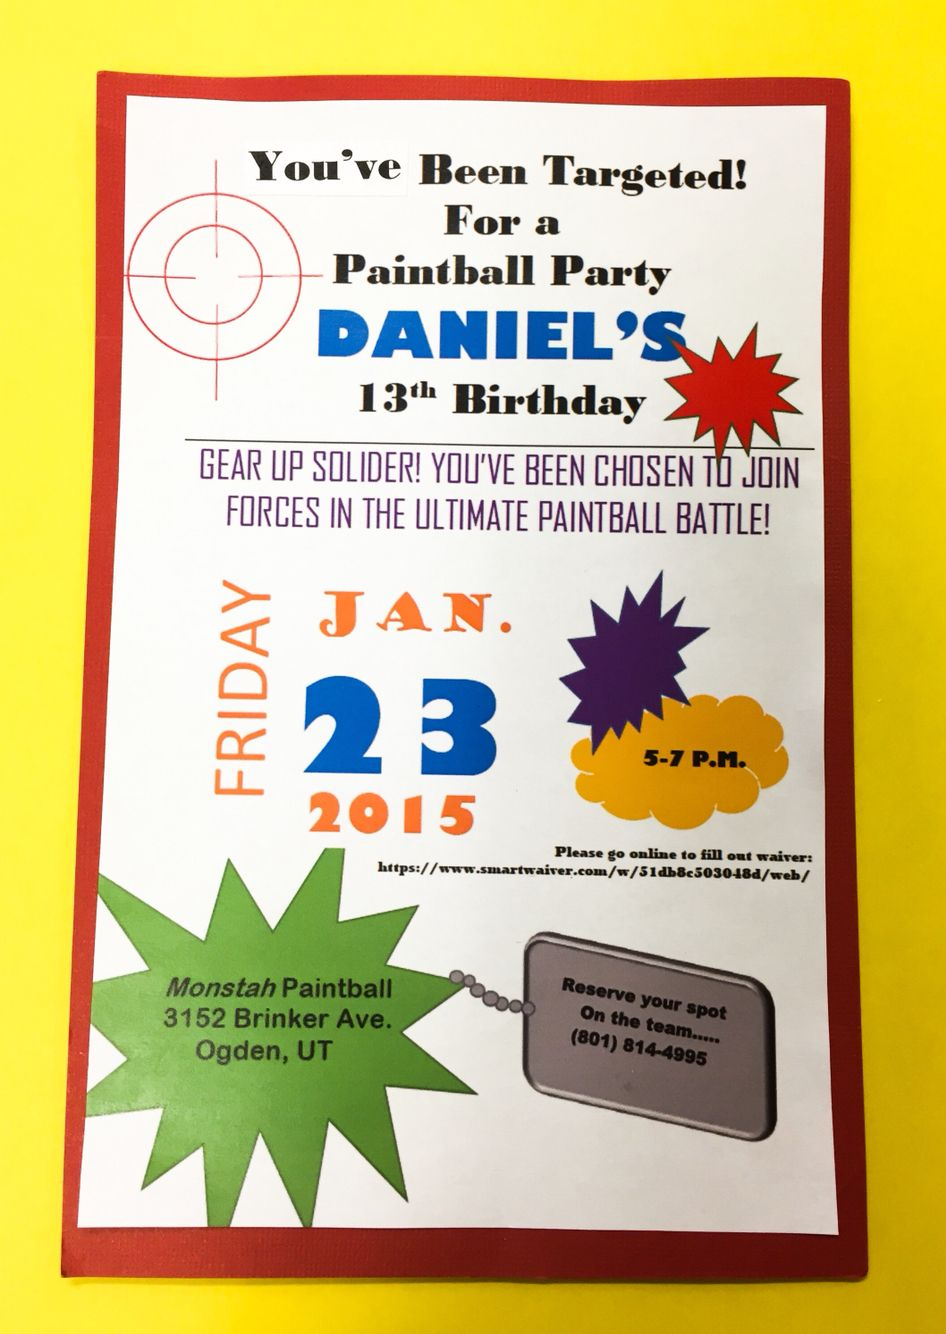 Paintball invite | Daniel\'s 13th Birthday-Paintball | Pinterest ...